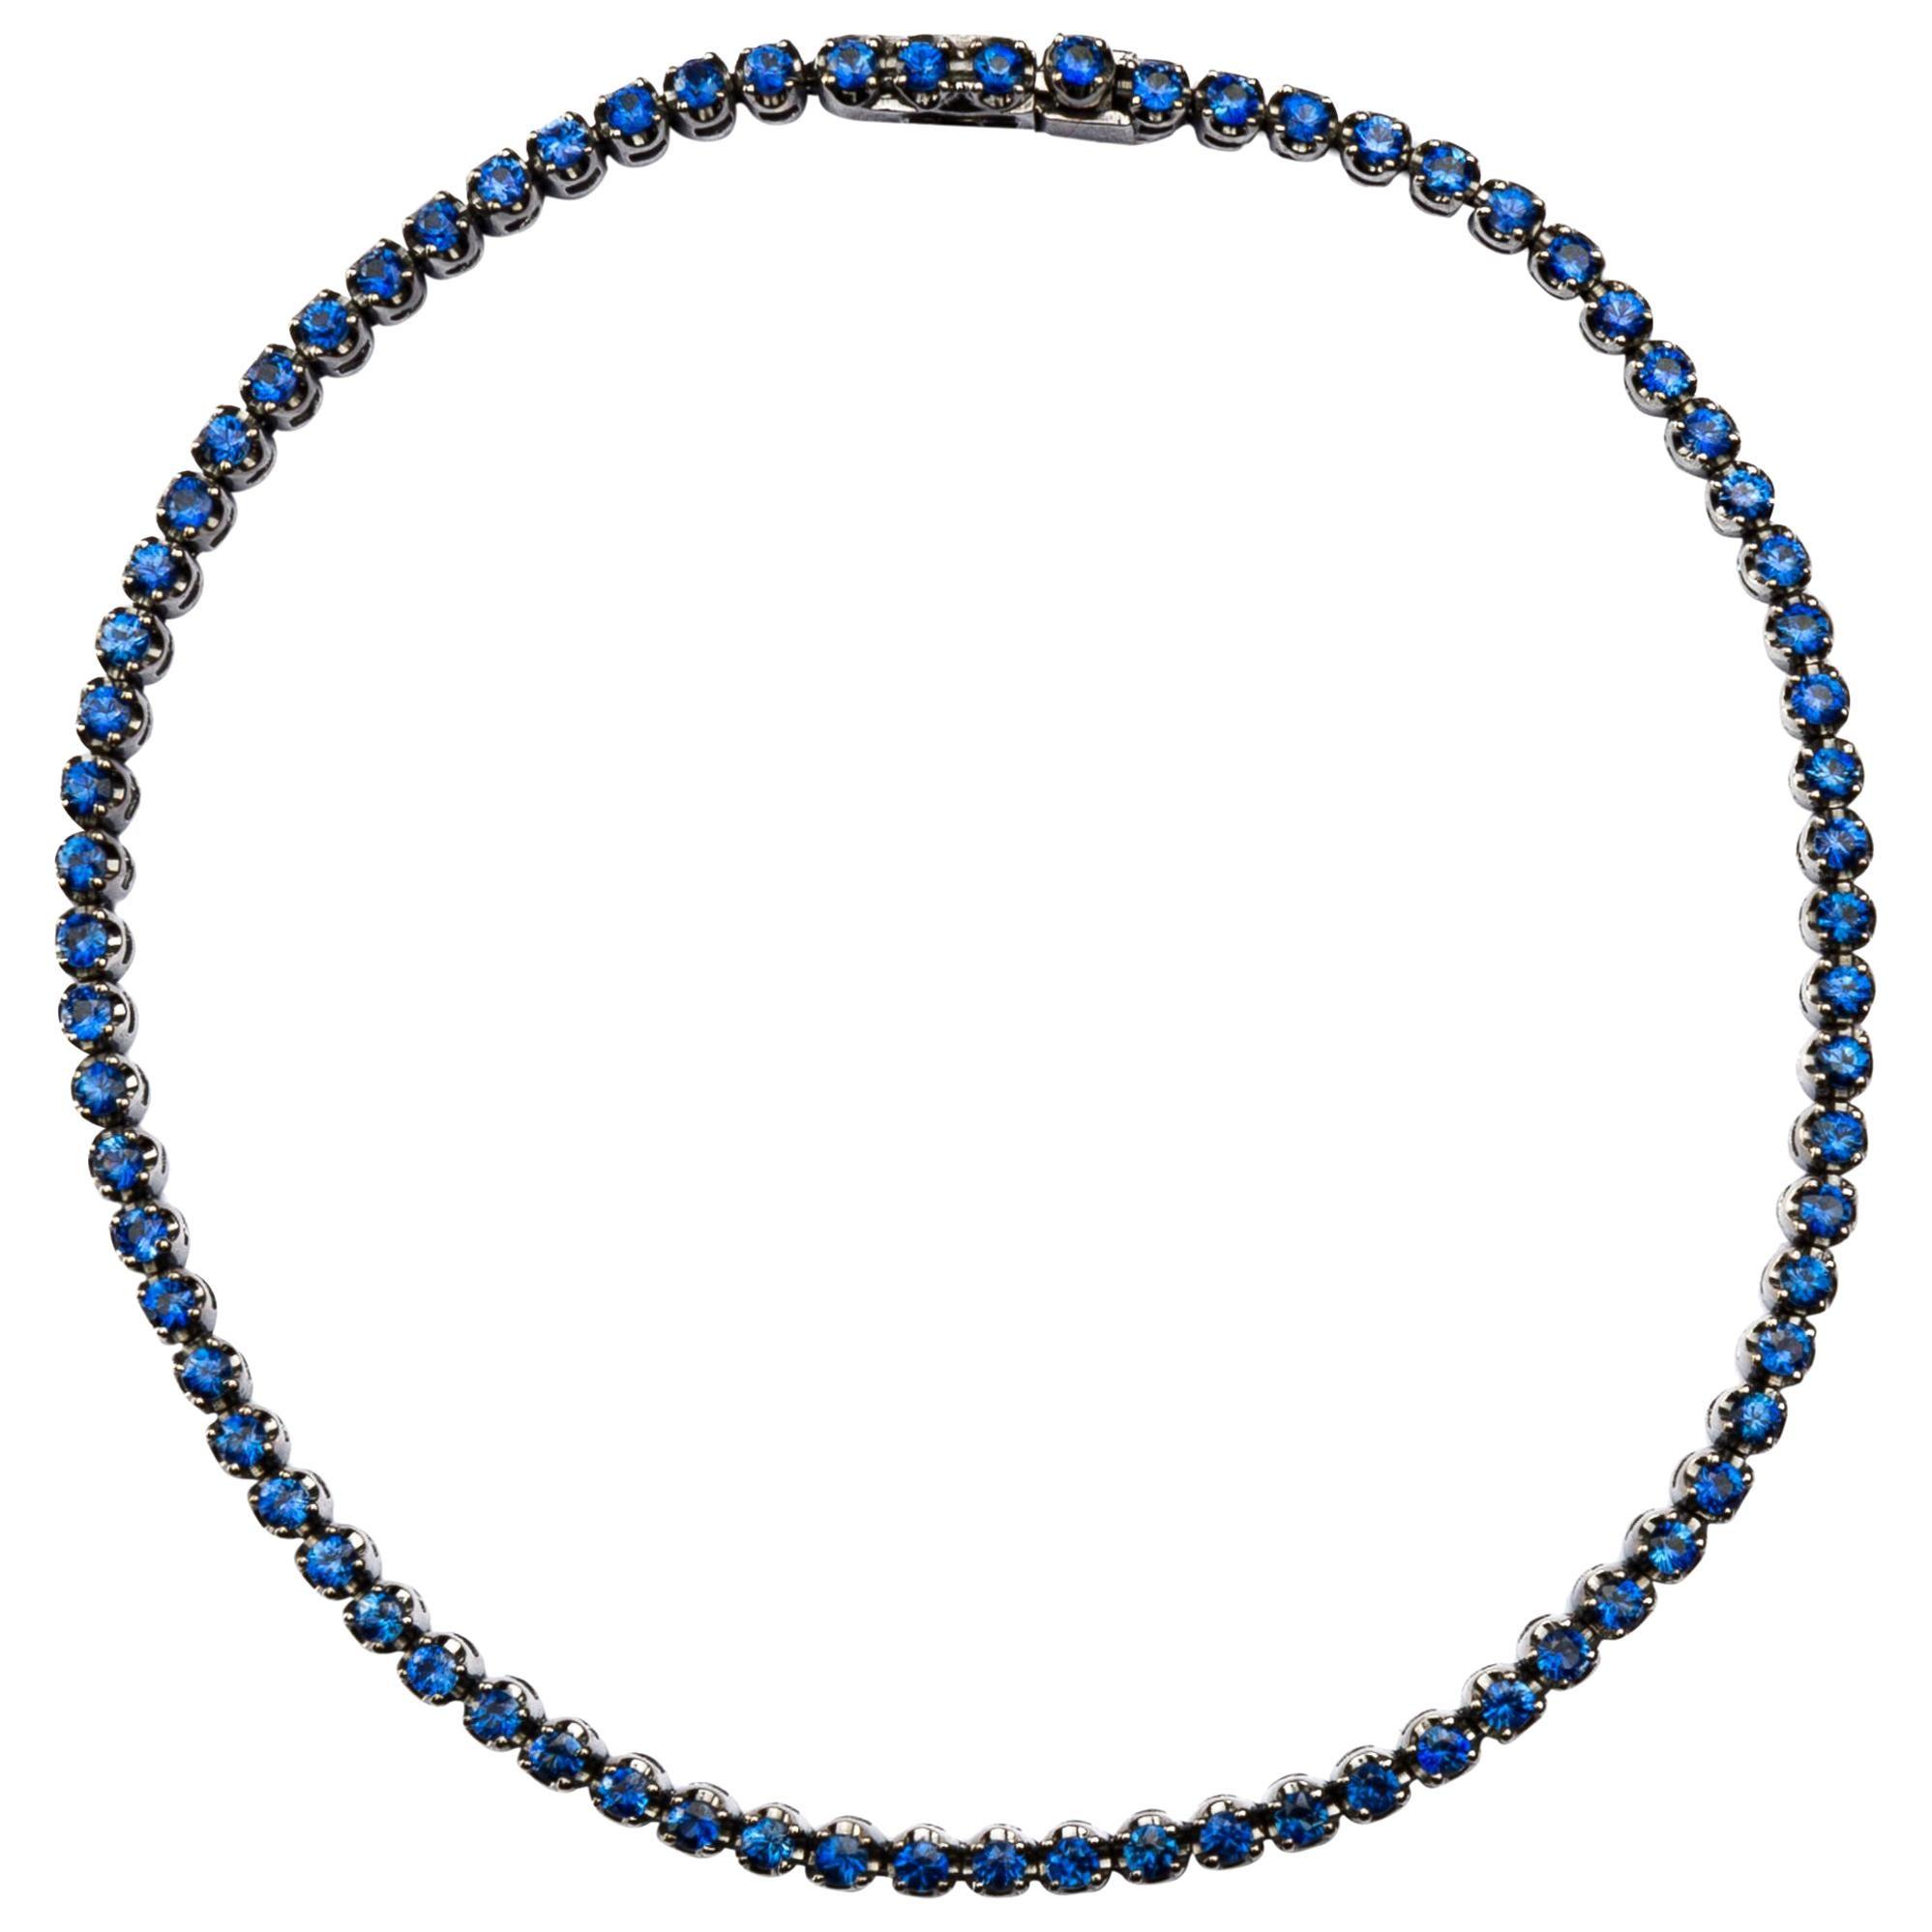 Alex Jona Blue Sapphire 18 Karat White Gold Tennis Bracelet